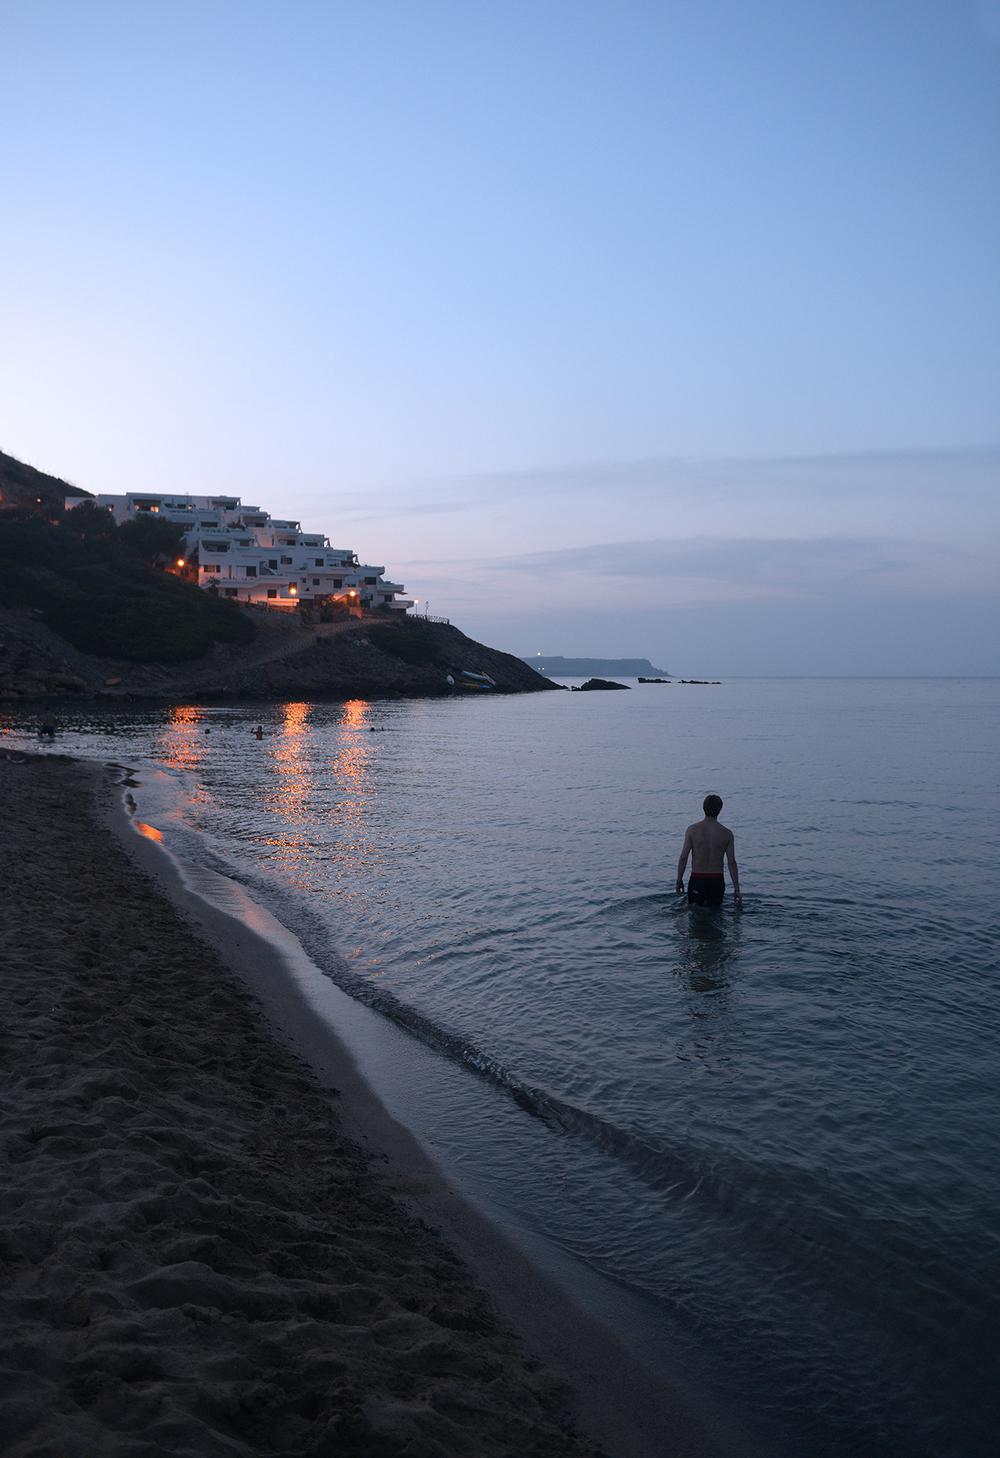 Välimeri, meri, Menorca, Baleaarit, matkablogi, matka